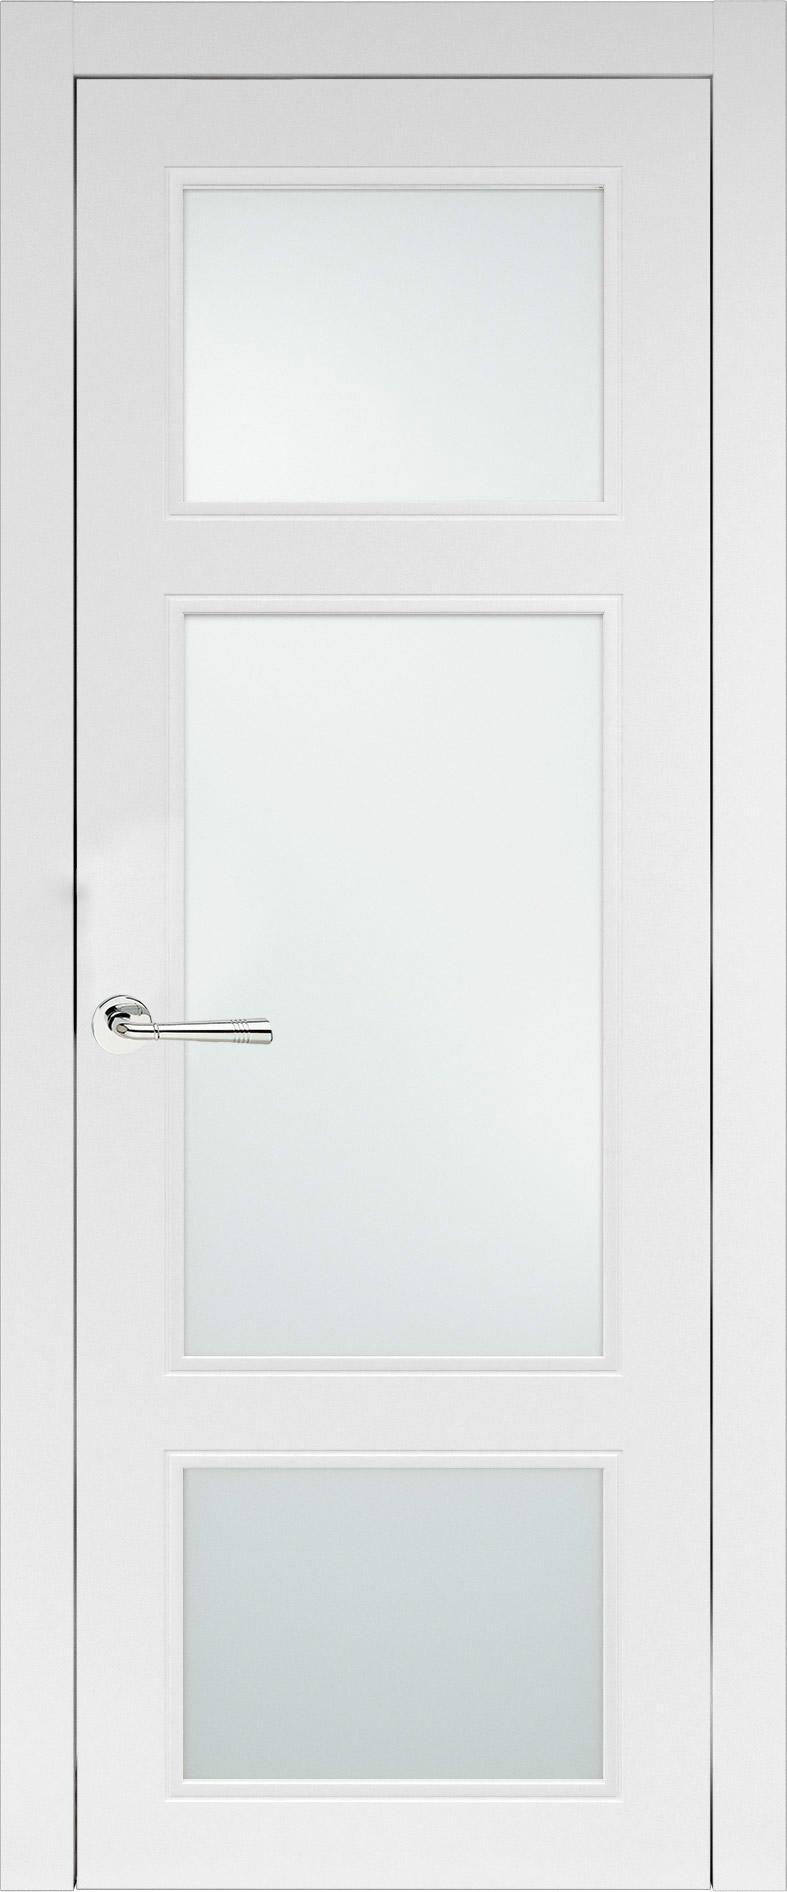 Siena Neo Classic цвет - Белая эмаль (RAL 9003) Со стеклом (ДО)